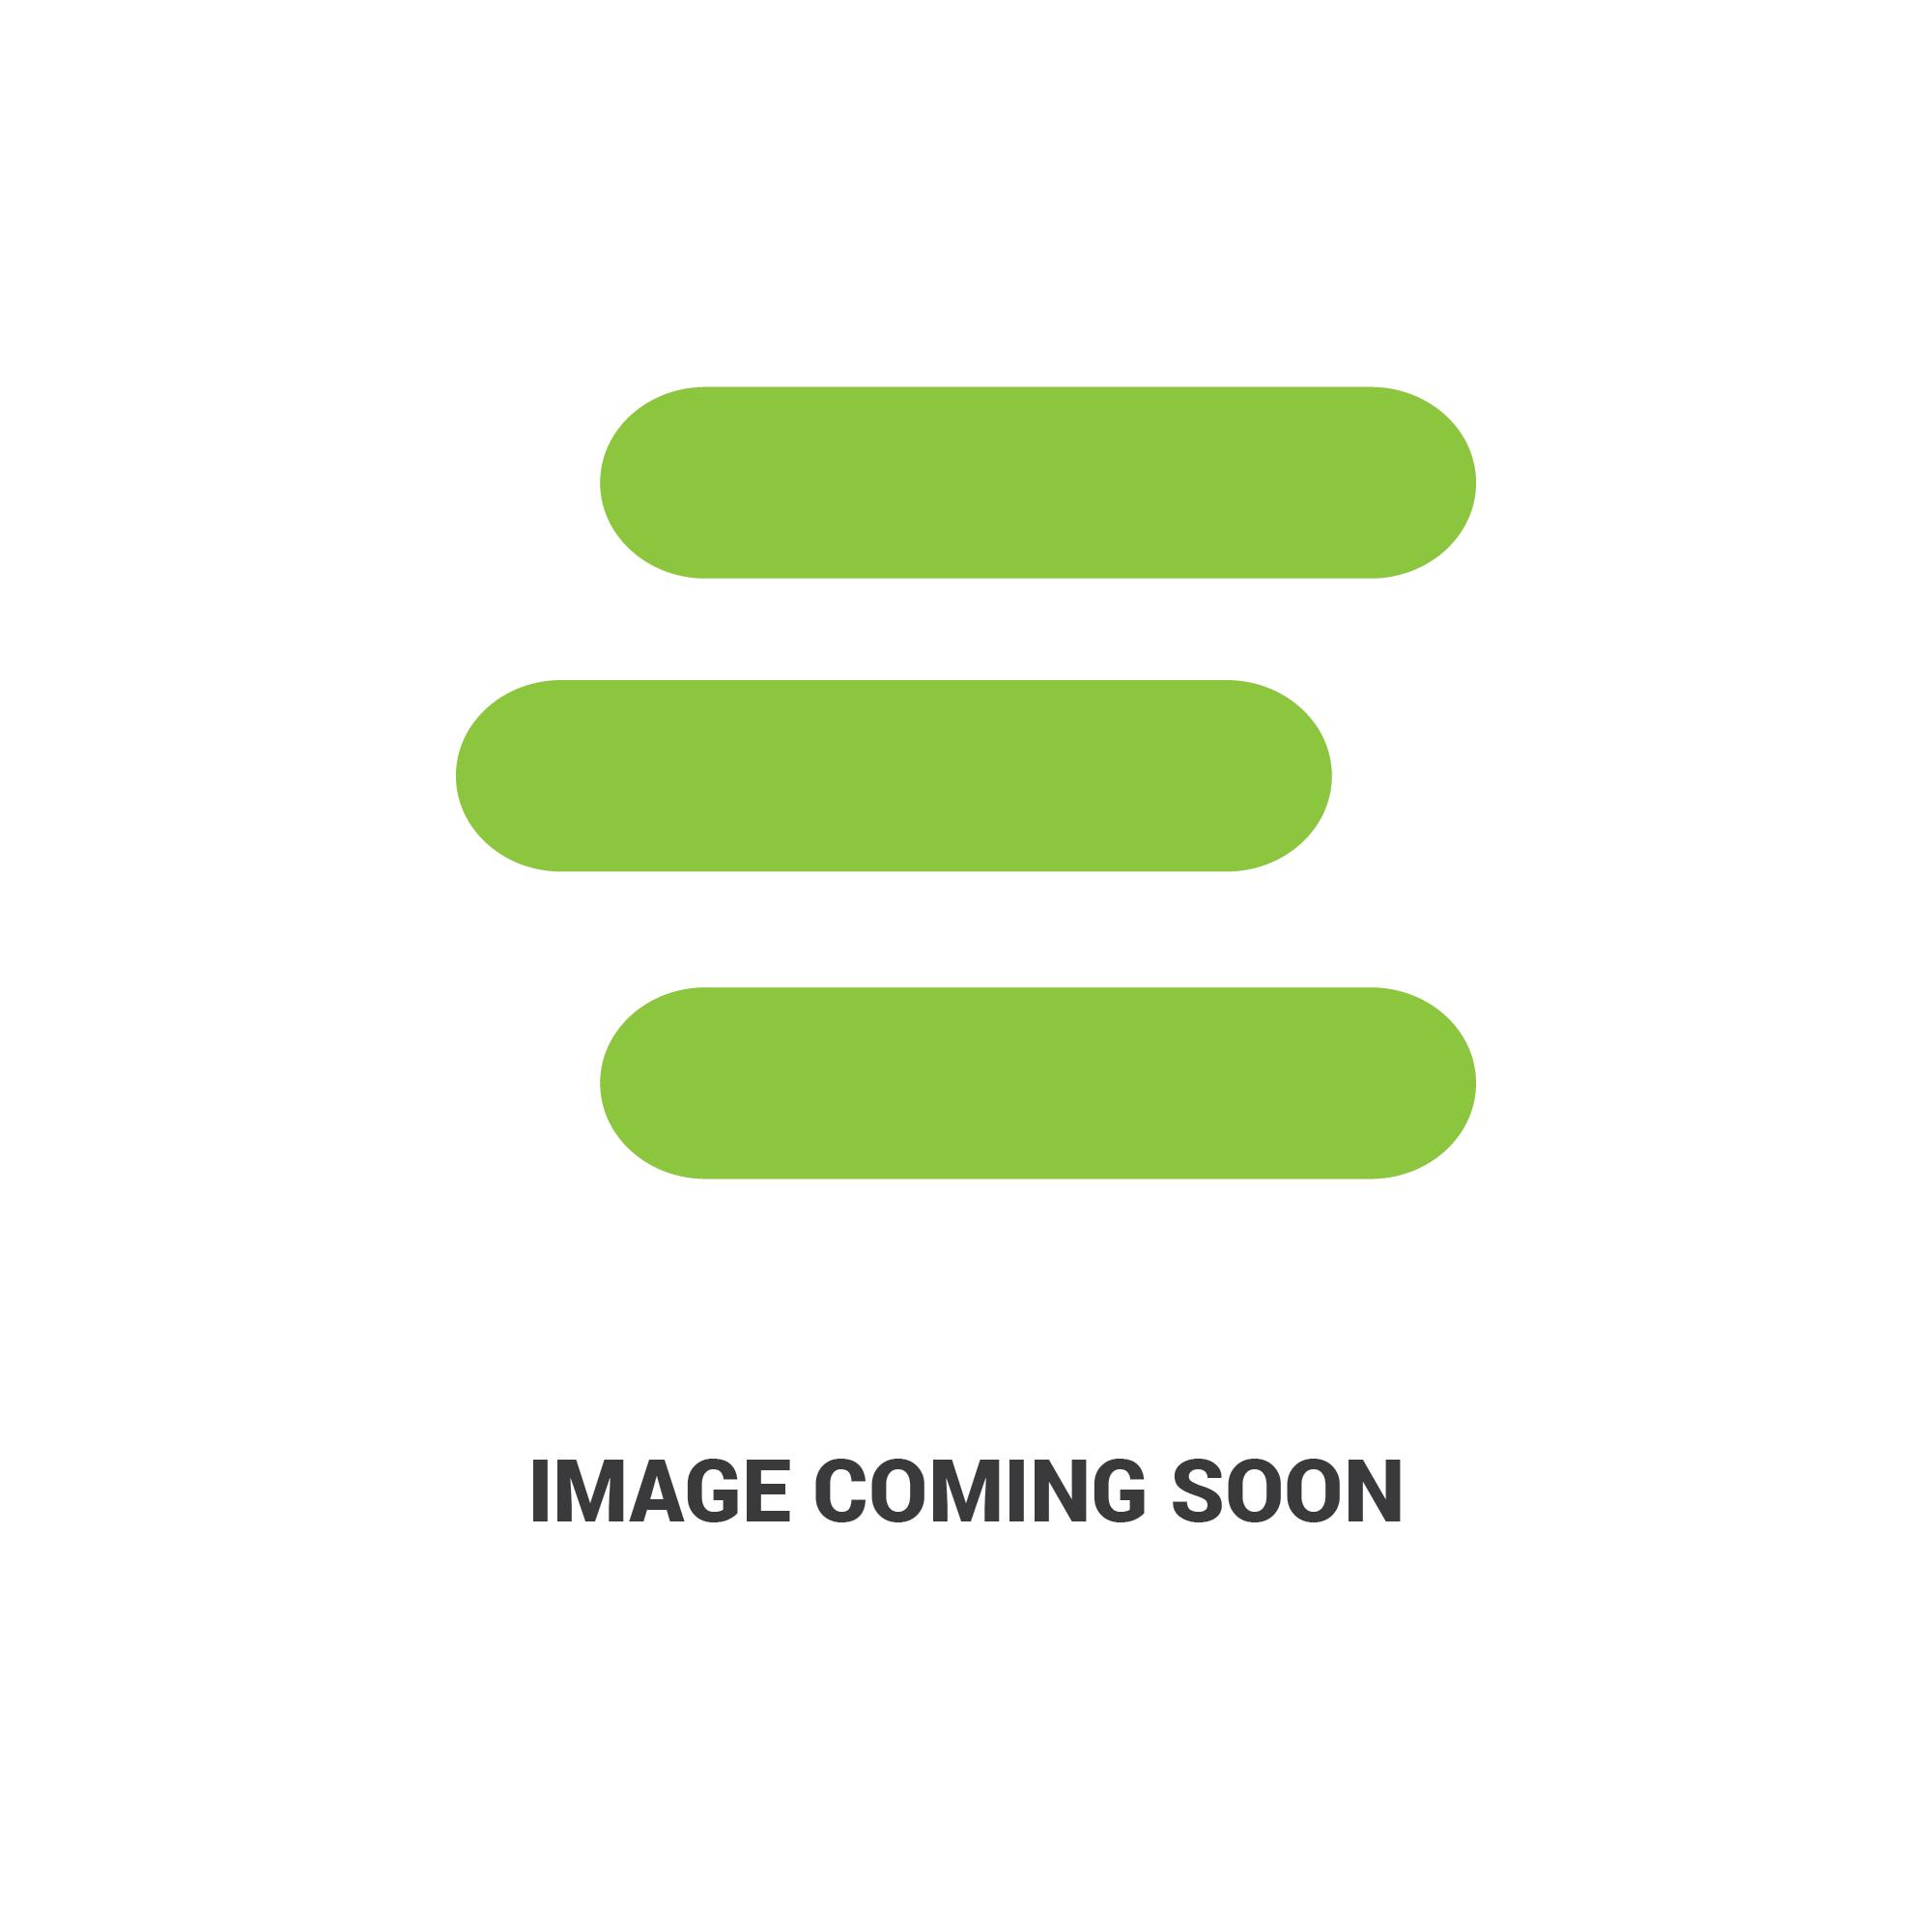 E-67325771212_1.jpg